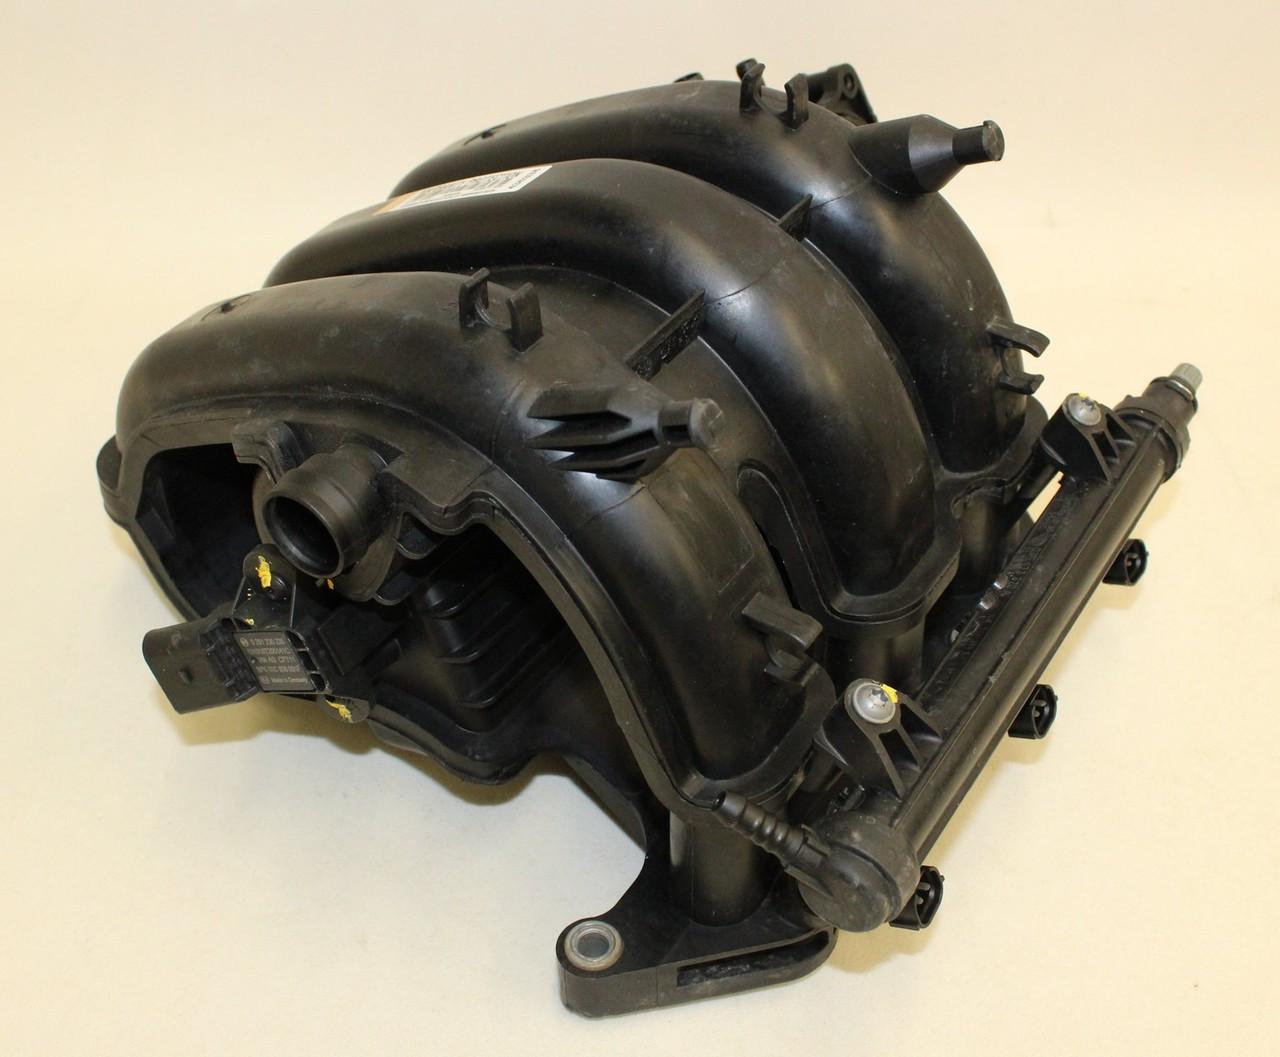 VW Polo 1 2 12V Inlet Manifold Fuel Rail Injectors Pt No O3E129711F '09-13